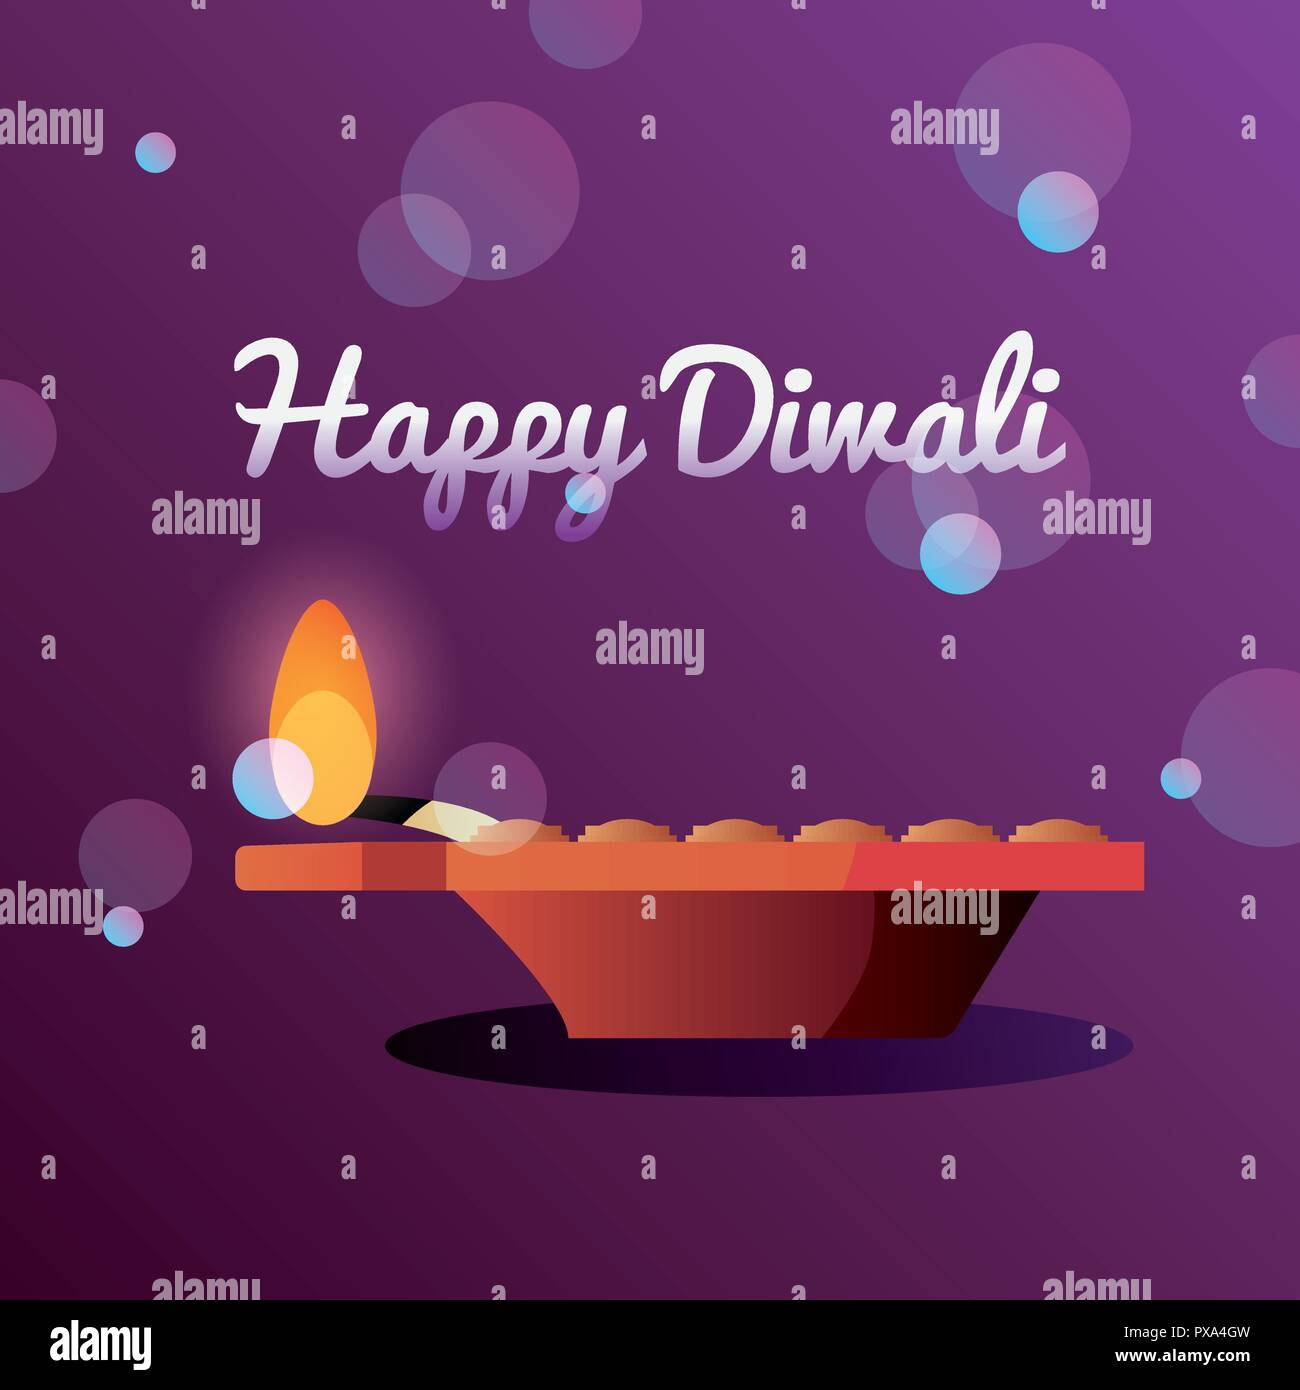 happy diwali burnig light celebration blurred background vector illustration - Stock Vector